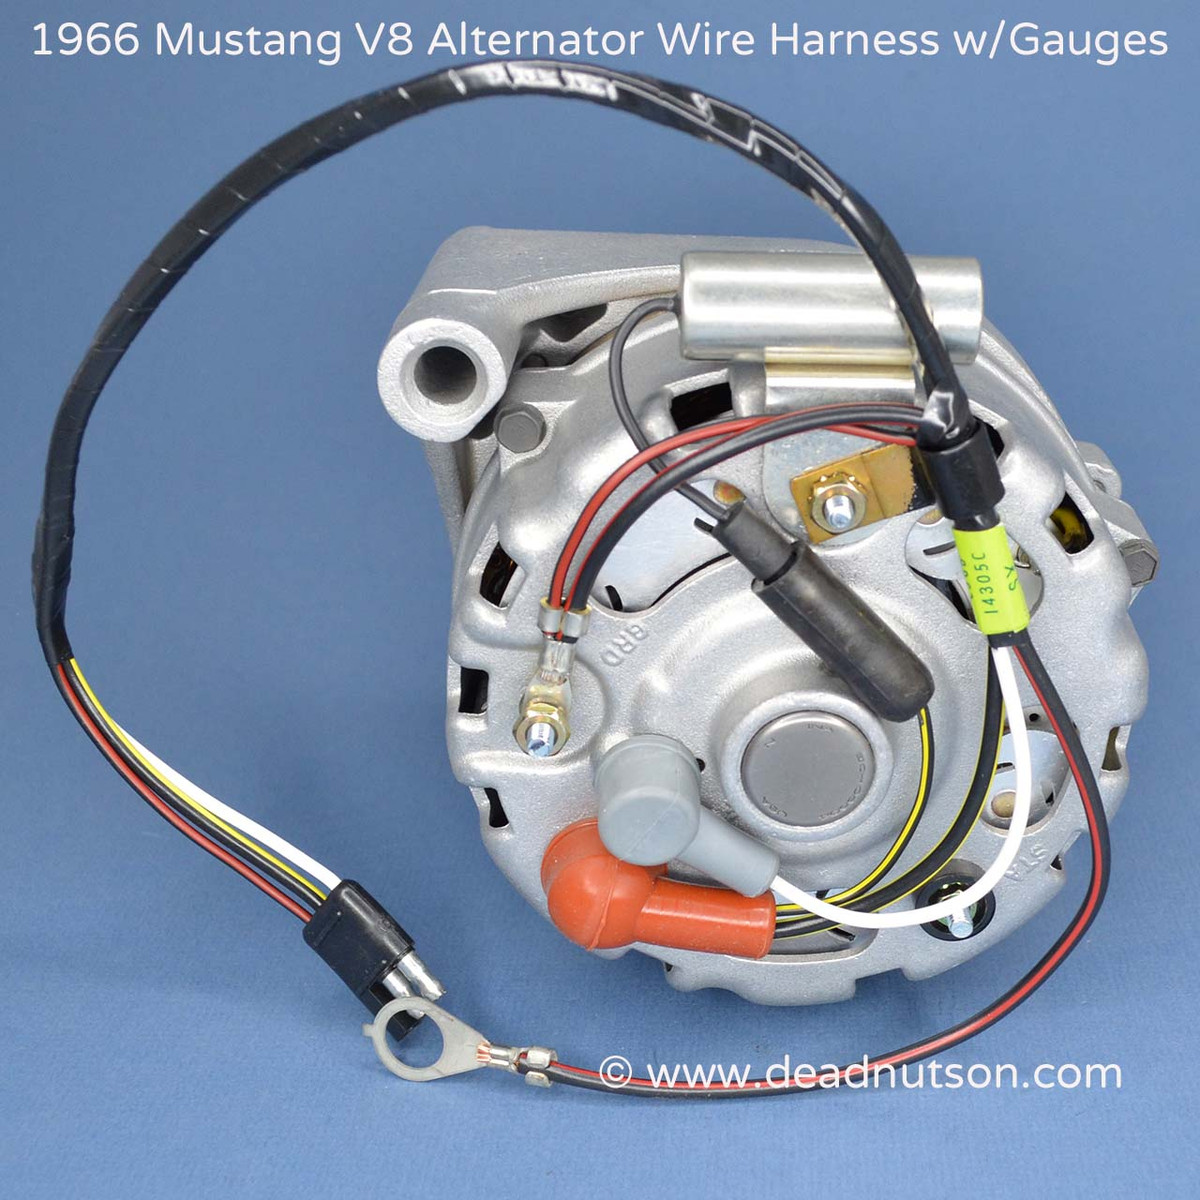 1964 1965 mustang alternator wire harness tag 289 w instrument gauges 6 Gauge Alternator Wiring Kit